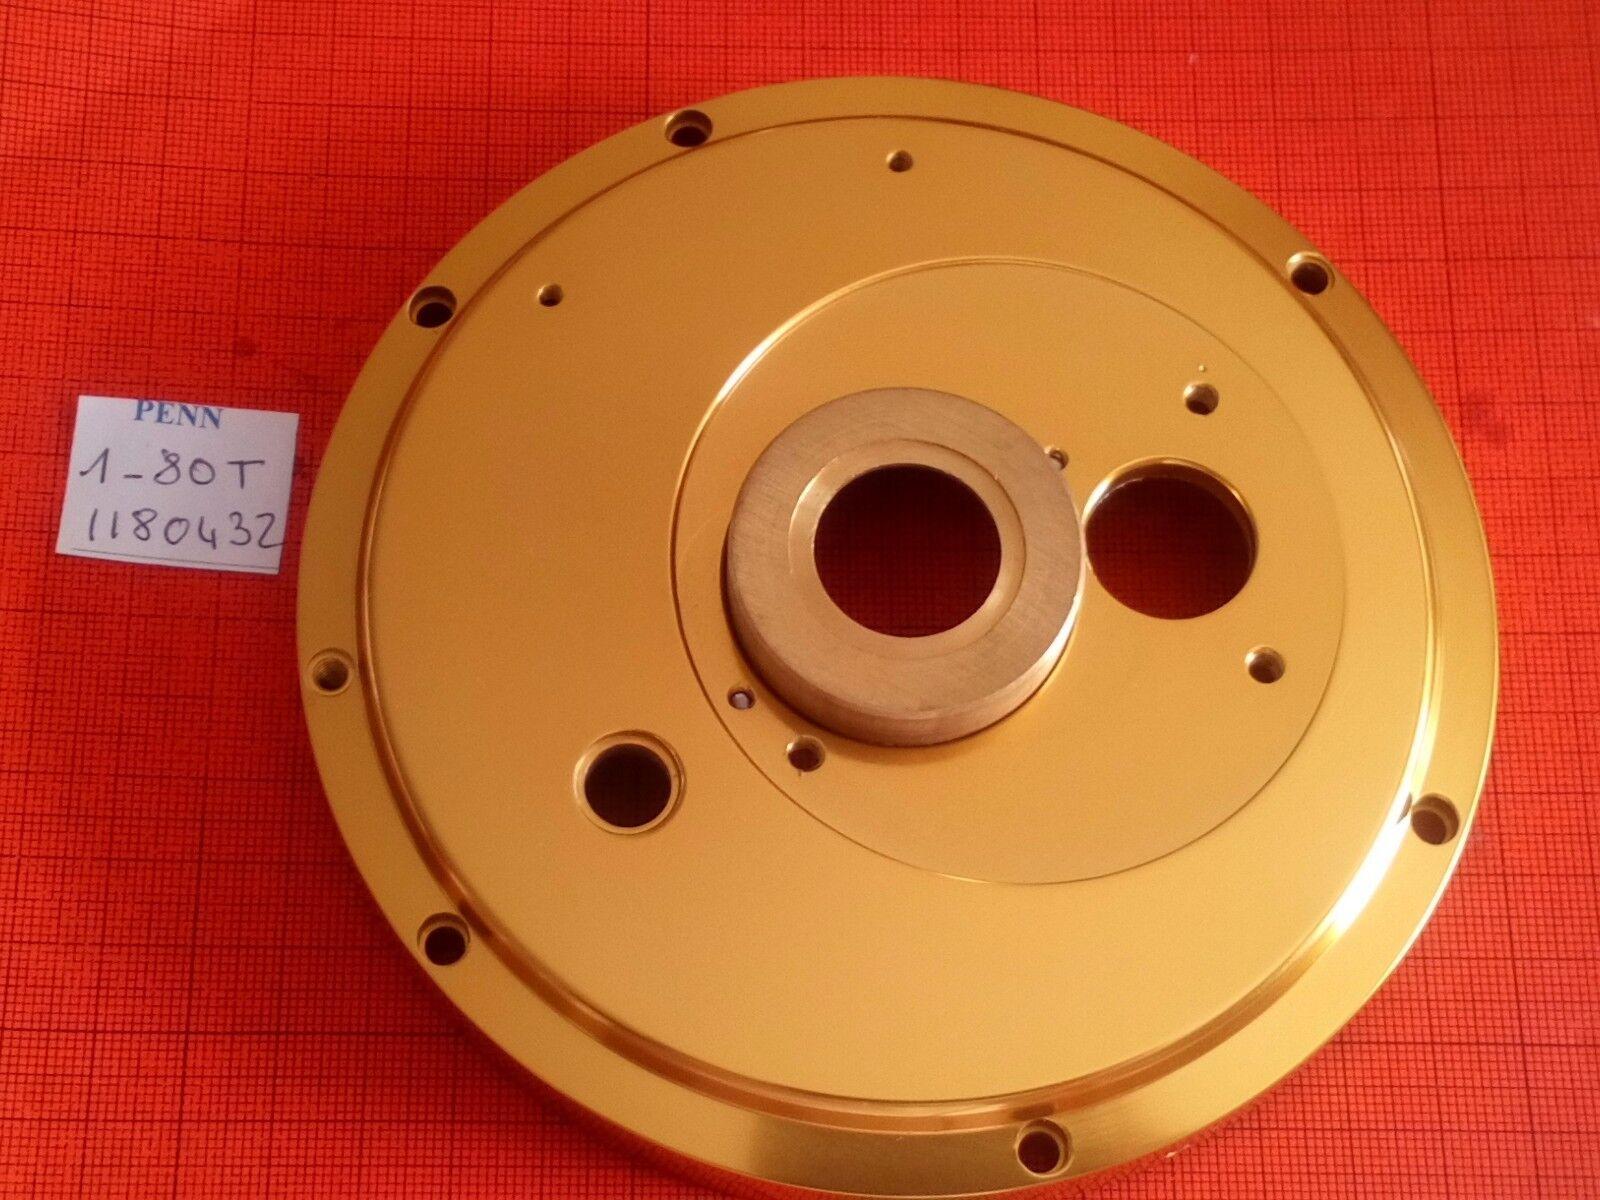 PART  1-80T HANDLE SIDE PLATE  PART  1180432 MOULINET REEL PENN INTERNATIONAL 80T Gold ffce74